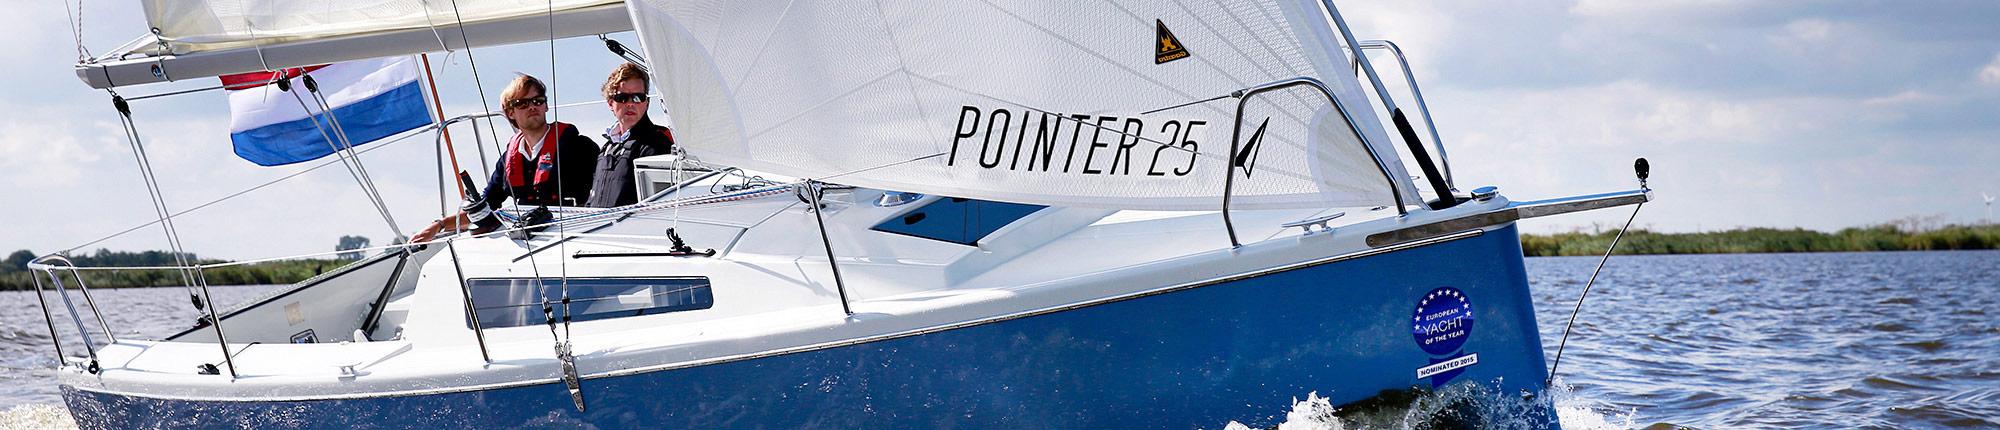 Pointer 25 Awards